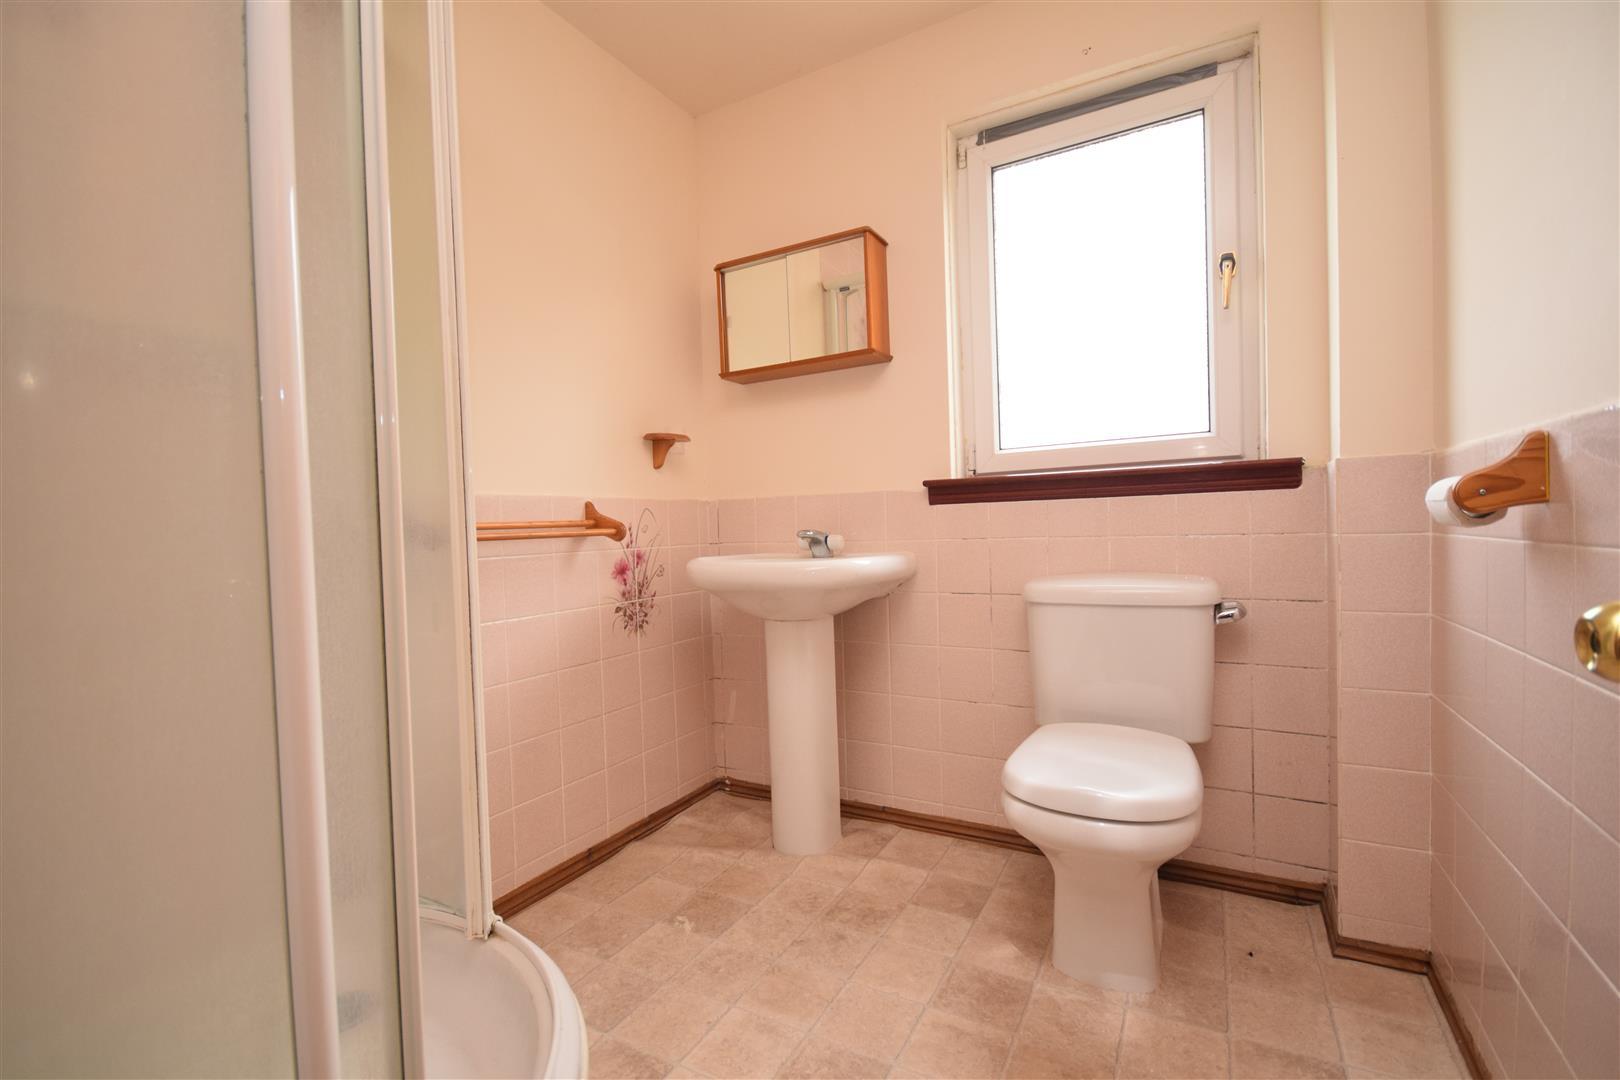 12, Muirlodge Place, Kinloch Rannoch, Perthshire, PH16 5PY, UK